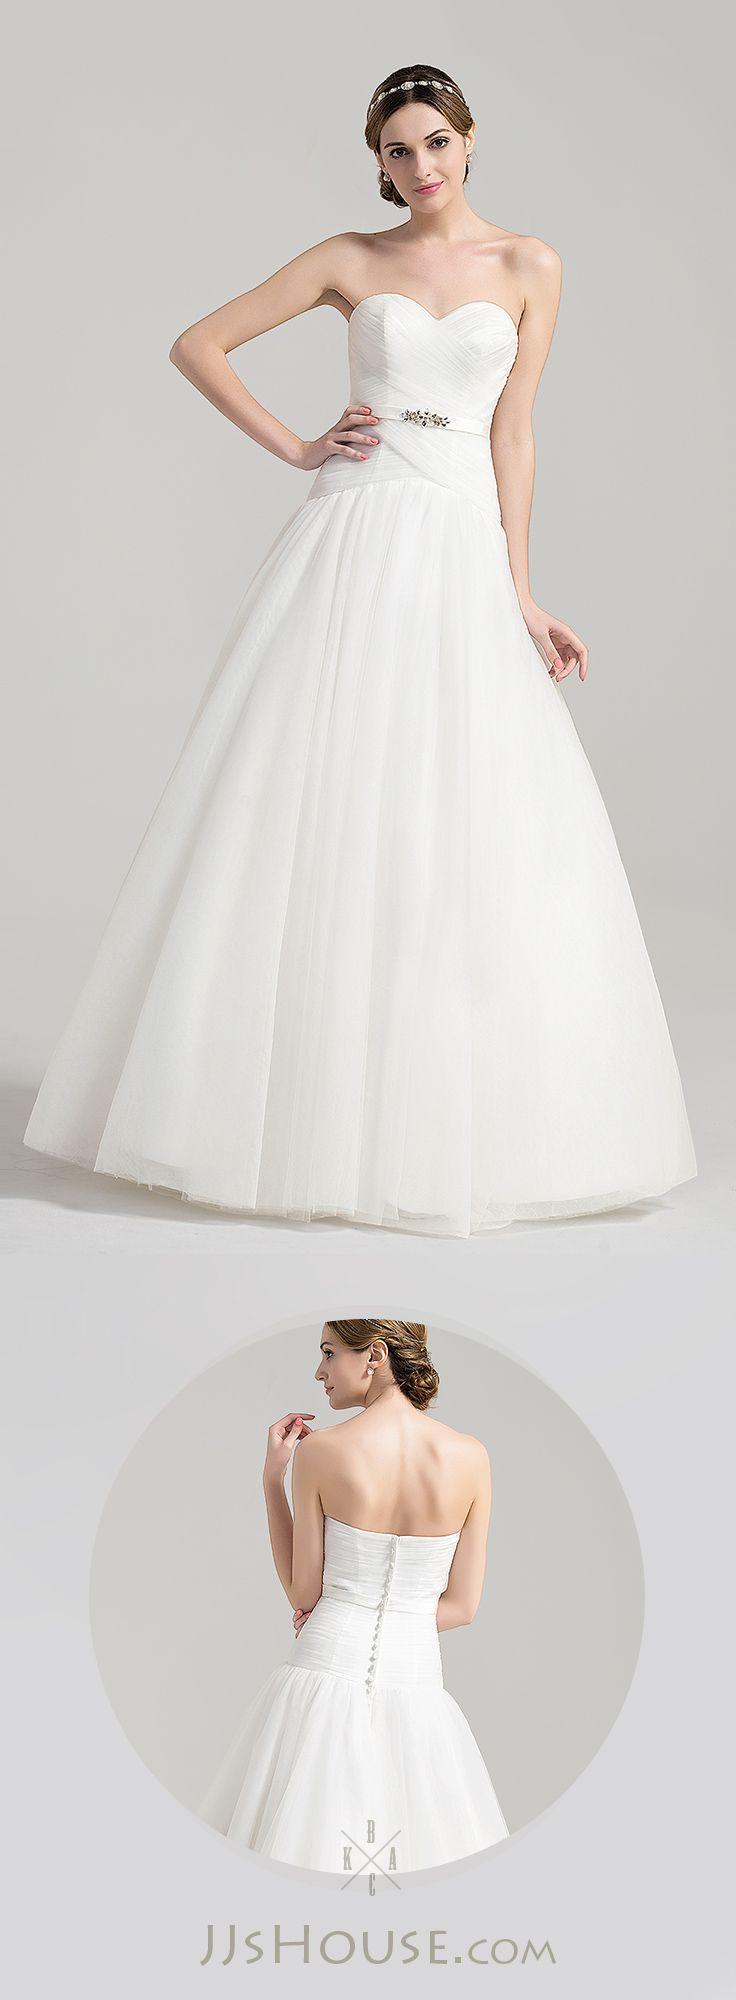 Ball-Gown Sweetheart Floor-Length Tulle Wedding Dress With Ruffle Beading  #jjshouse